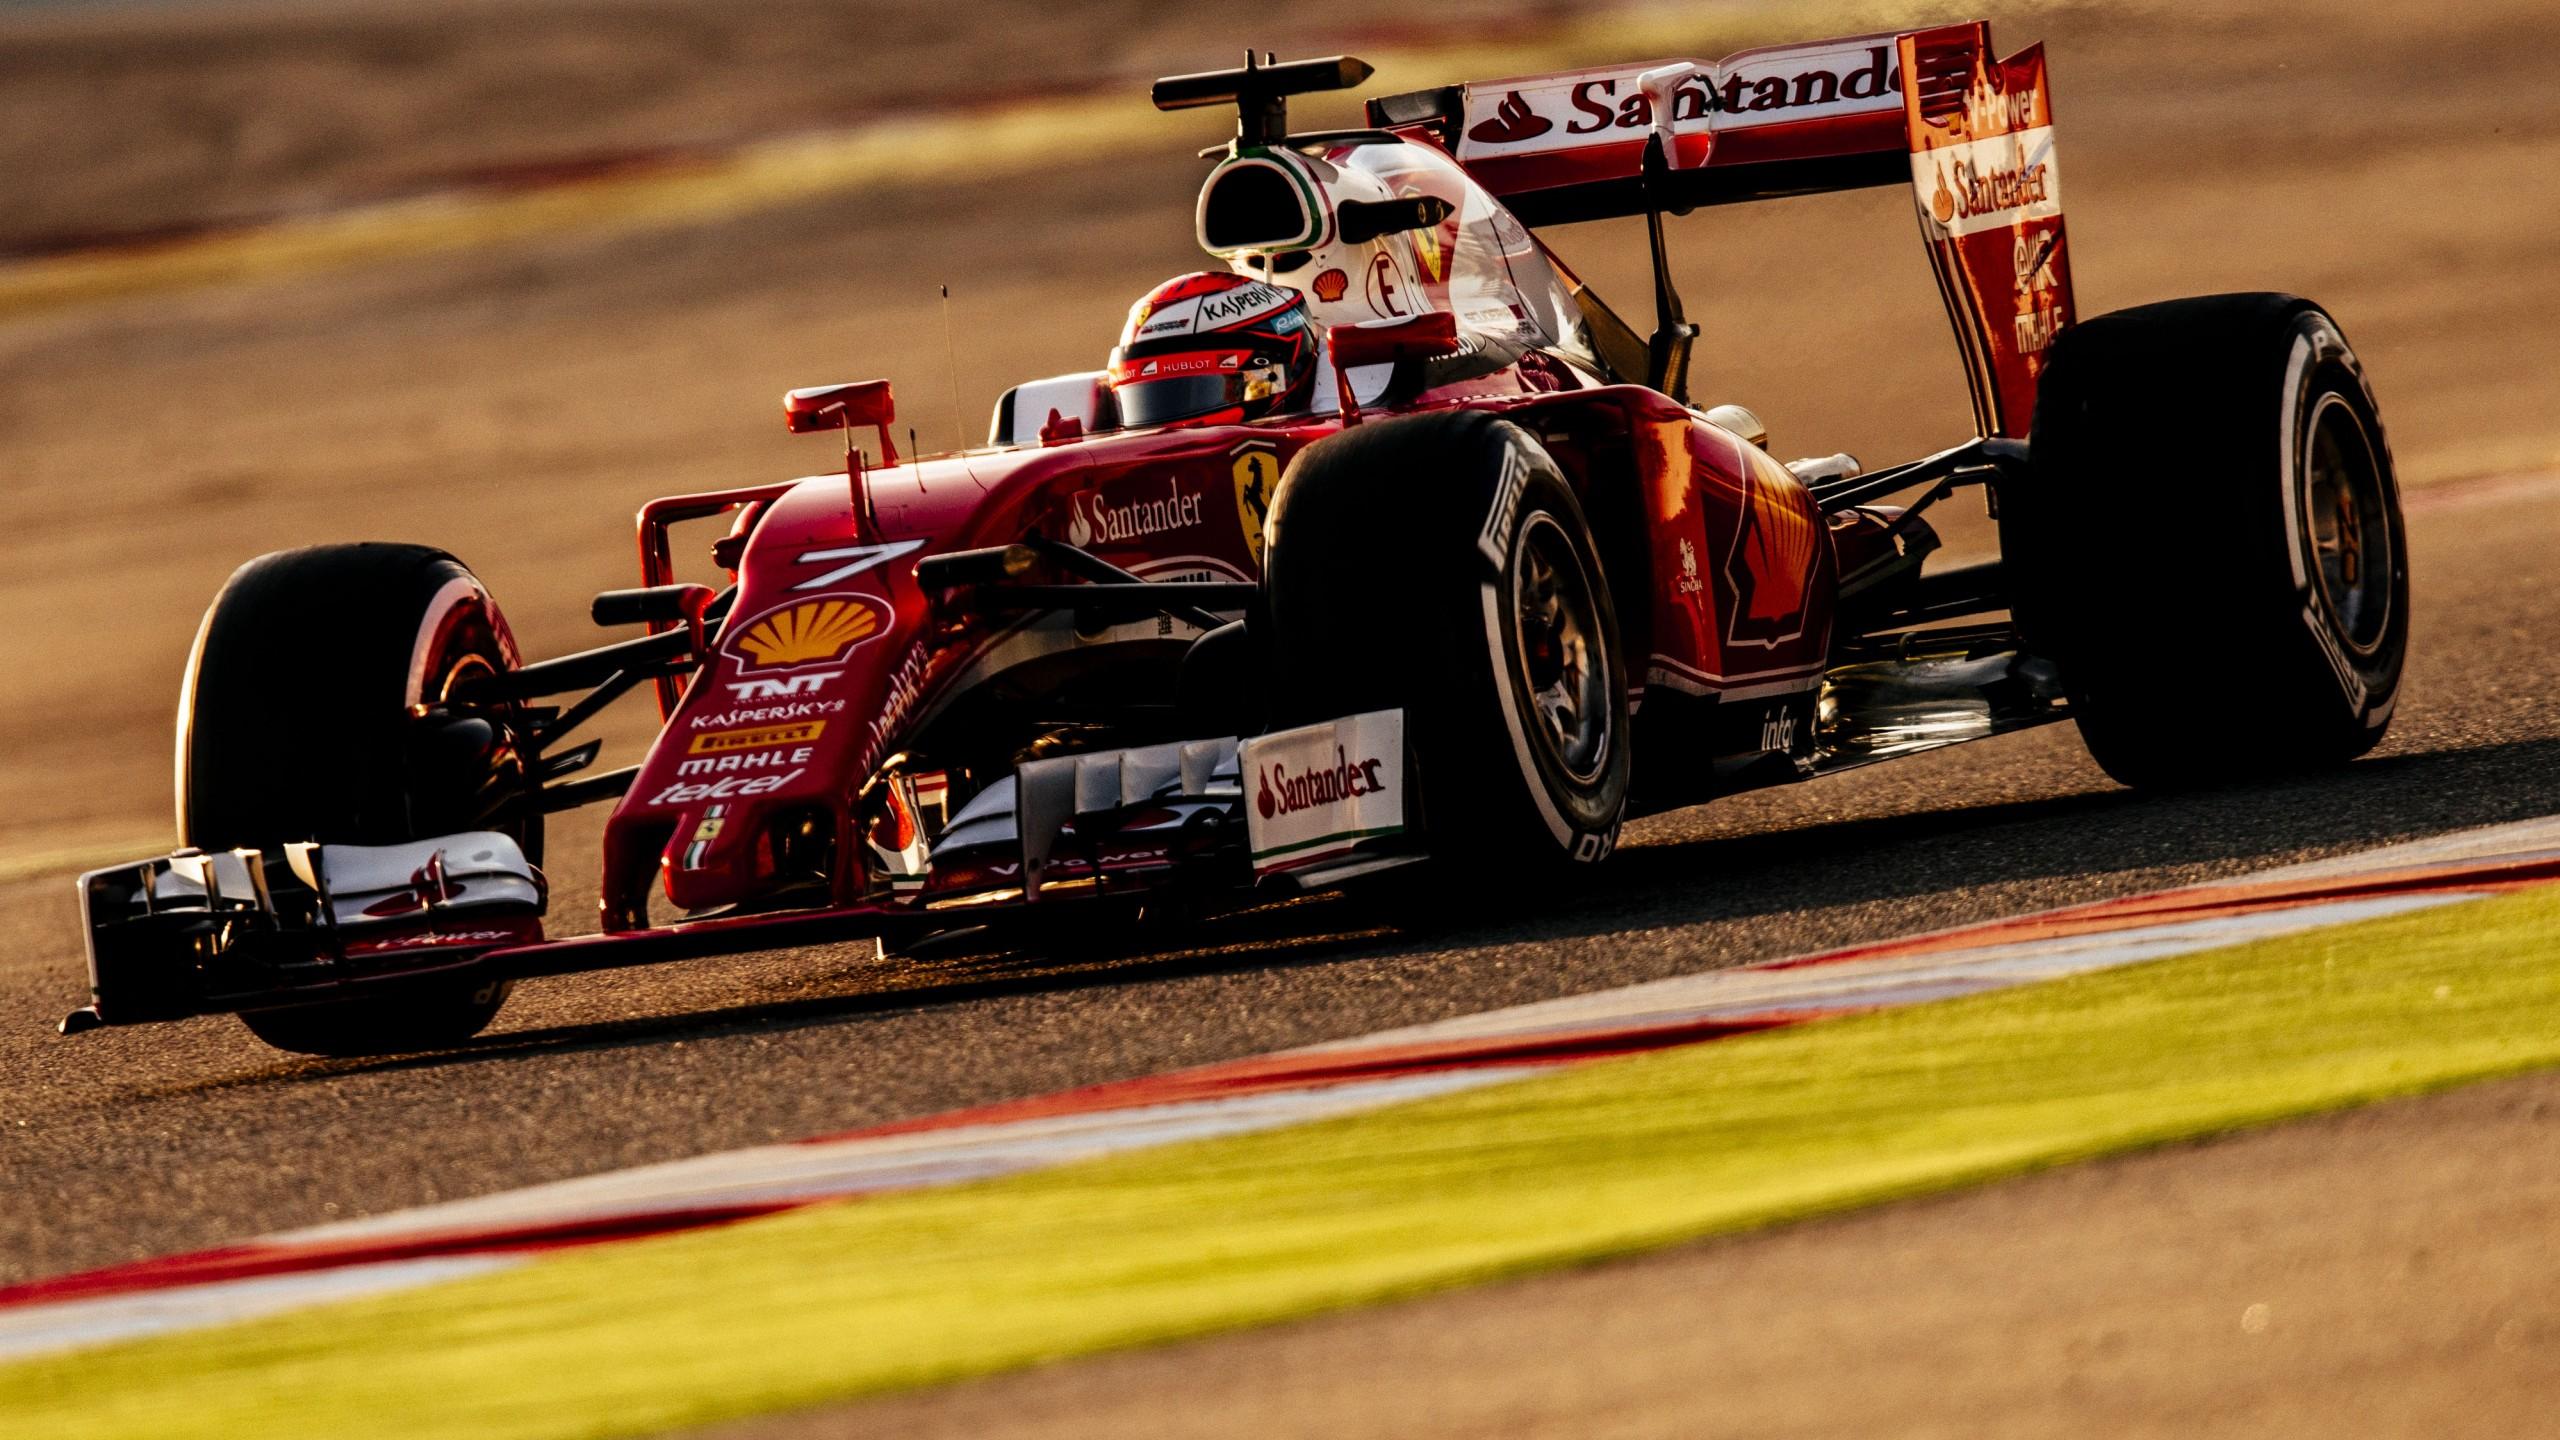 Wallpaper Ferrari SF16-H, Formula 1, F1, red, Cars & Bikes ...